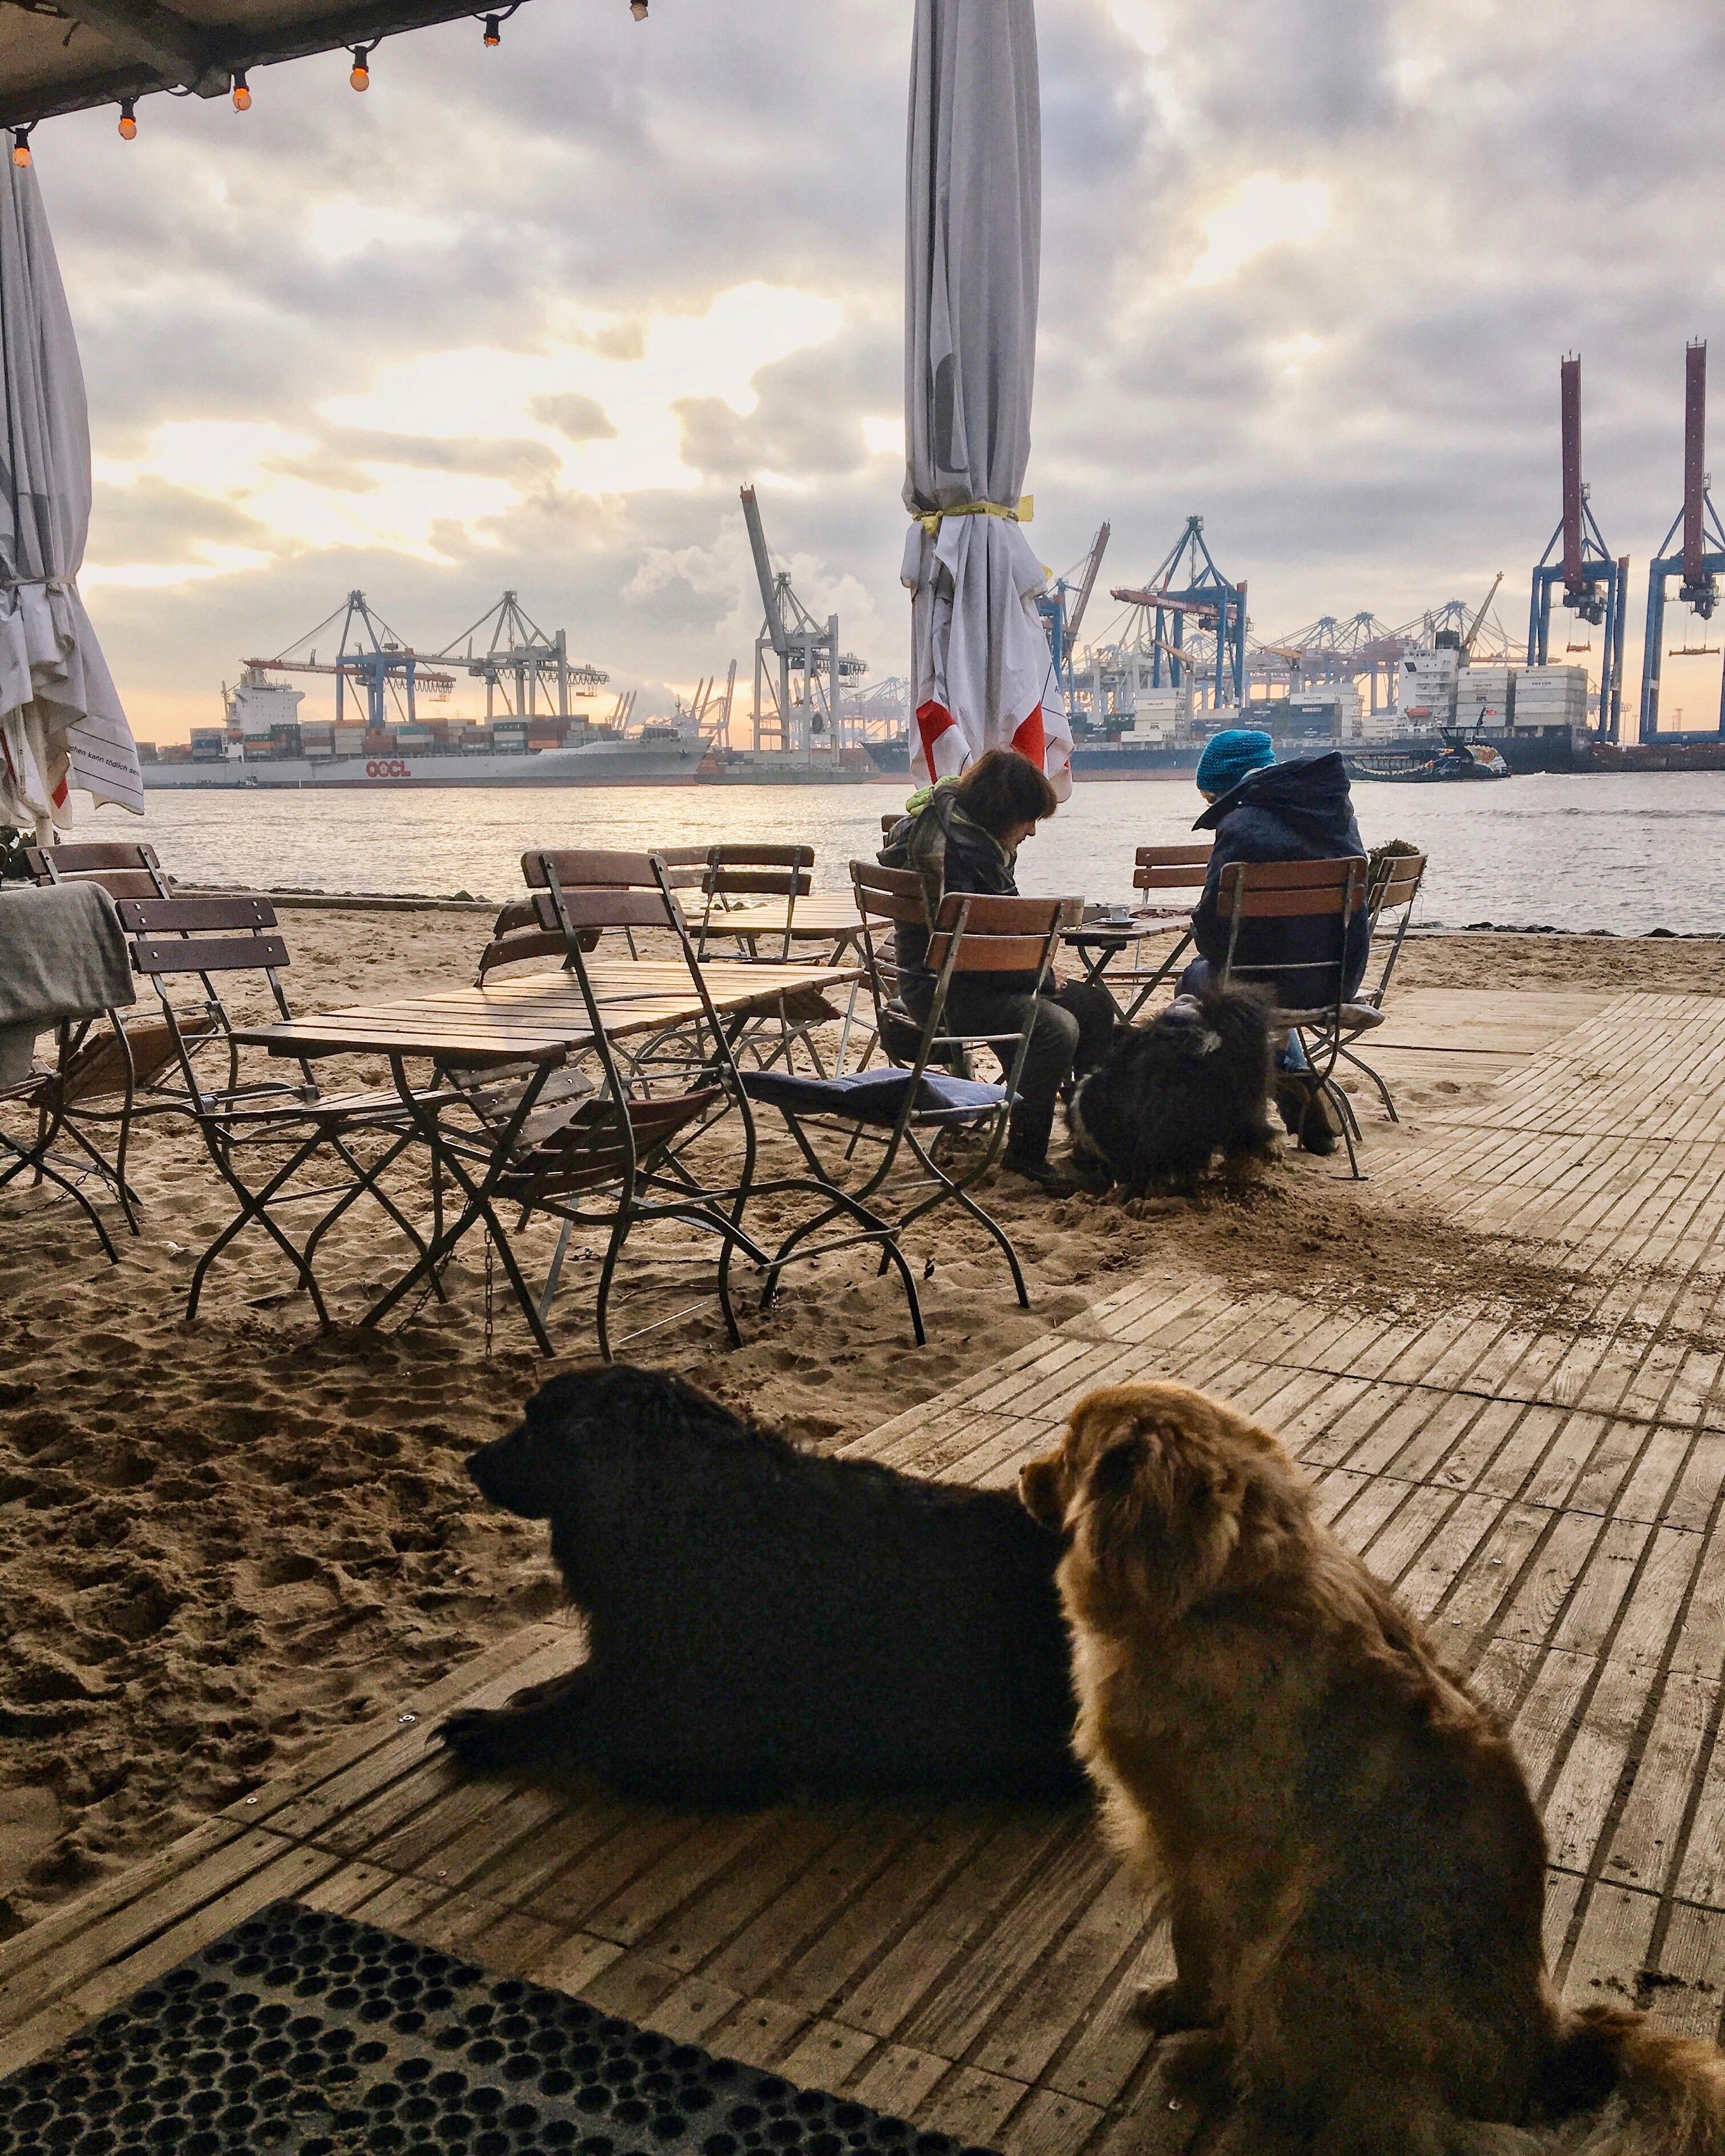 Strandkiosk Övelgönne Hamburg Fotospot